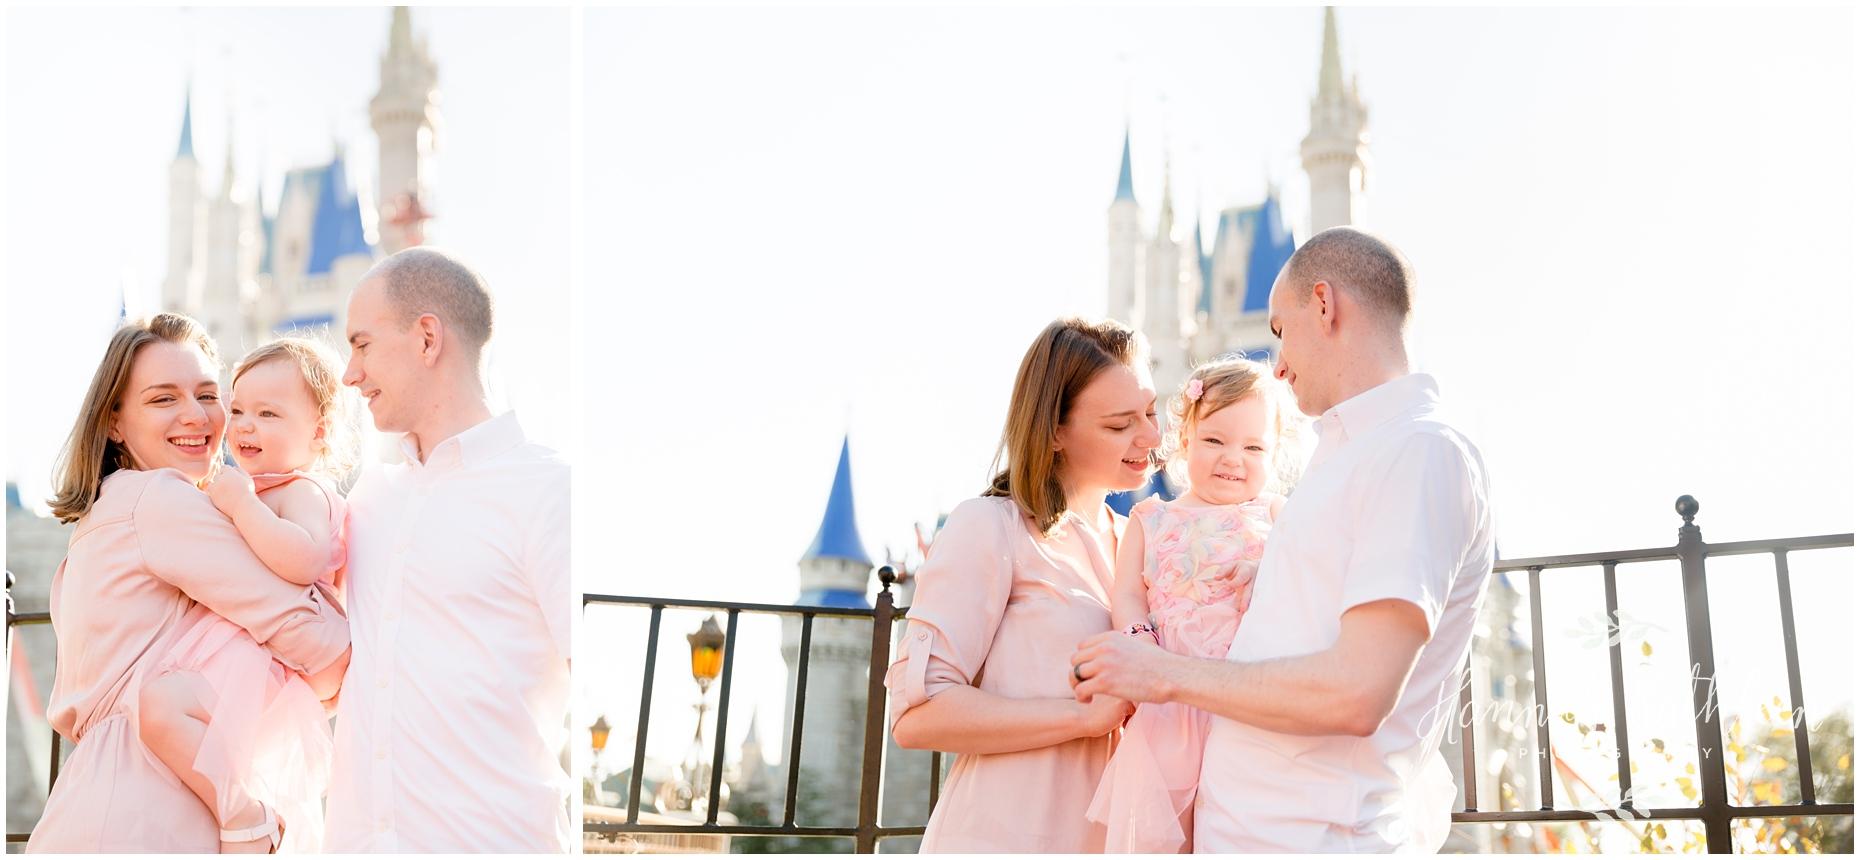 Disney_World_Magic_Kingdom_Family_Photography_Session_Dumbo